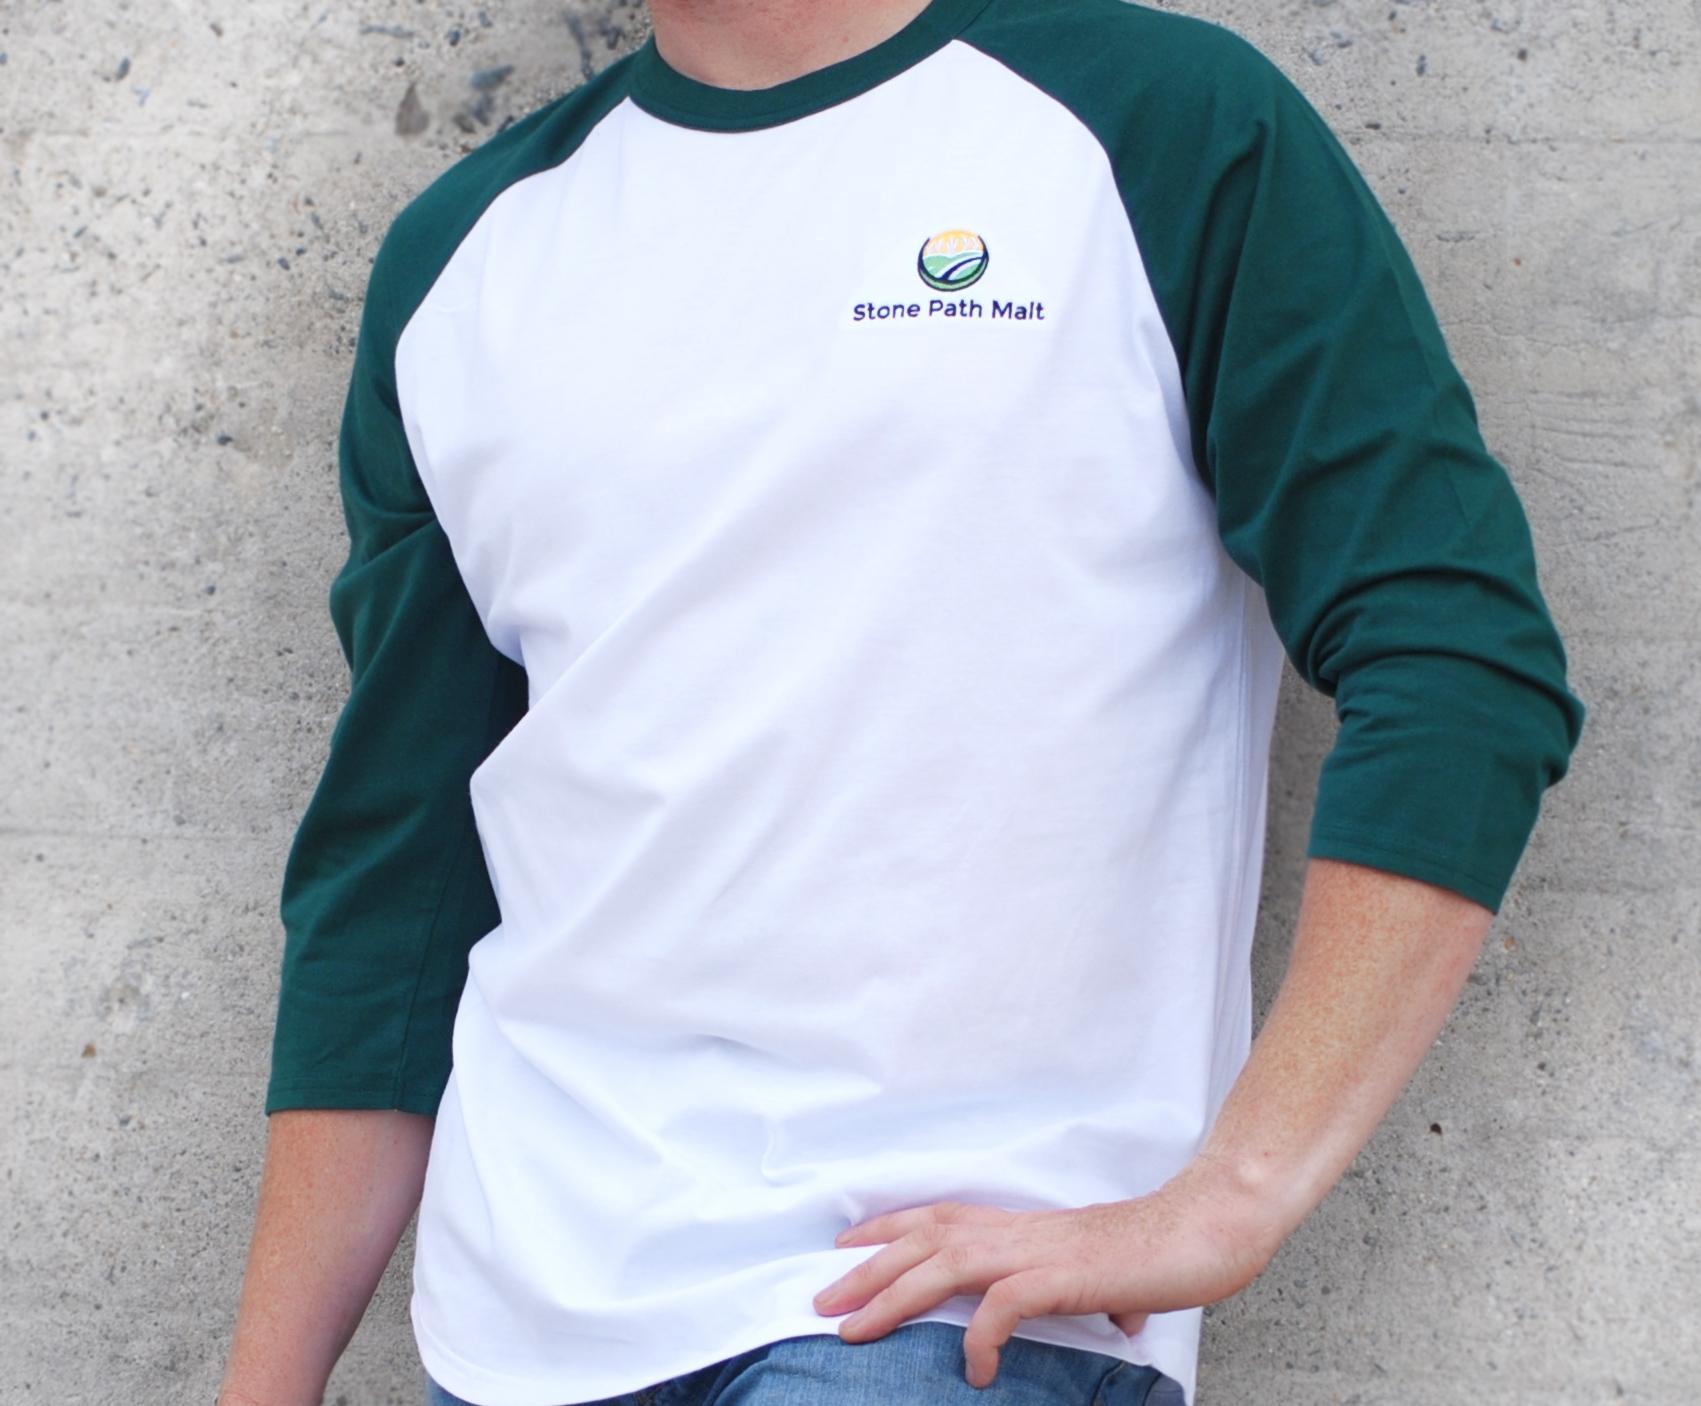 Green_Sleeve.jpg